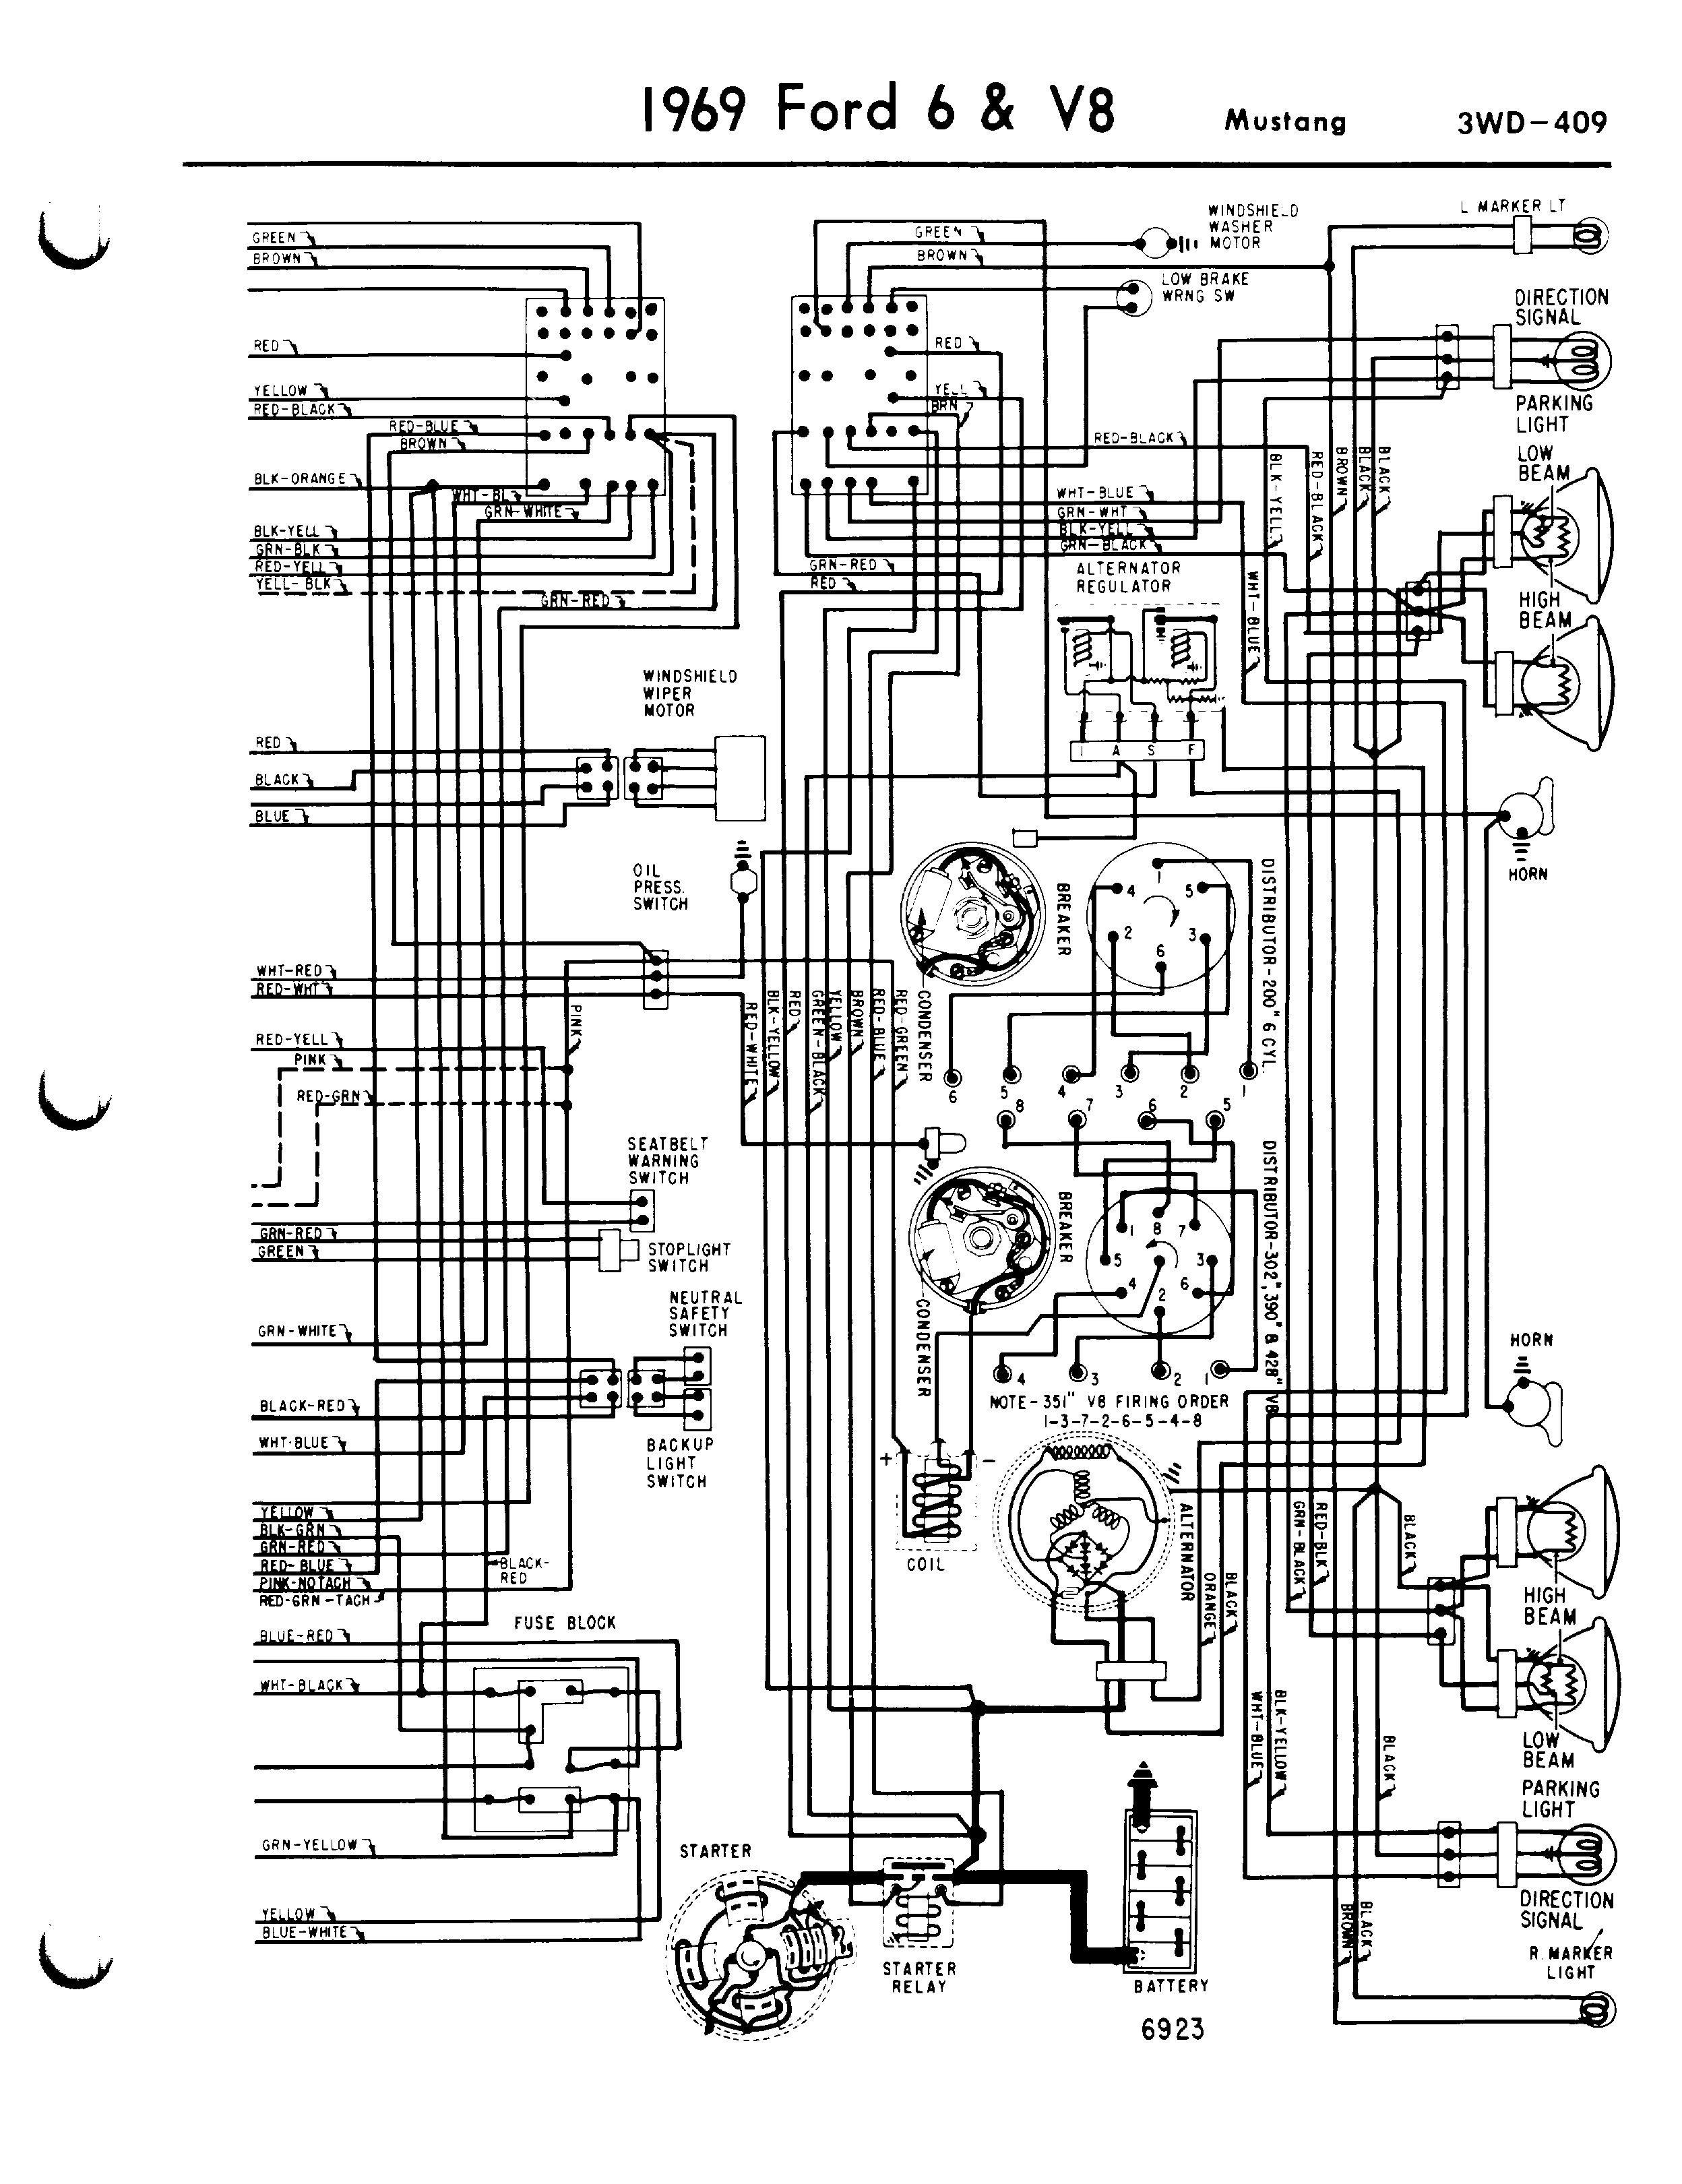 2001 ford Focus Wiring Diagram ford Diagrams Mesmerizing Mustang Wiring Diagram Blurts Of 2001 ford Focus Wiring Diagram